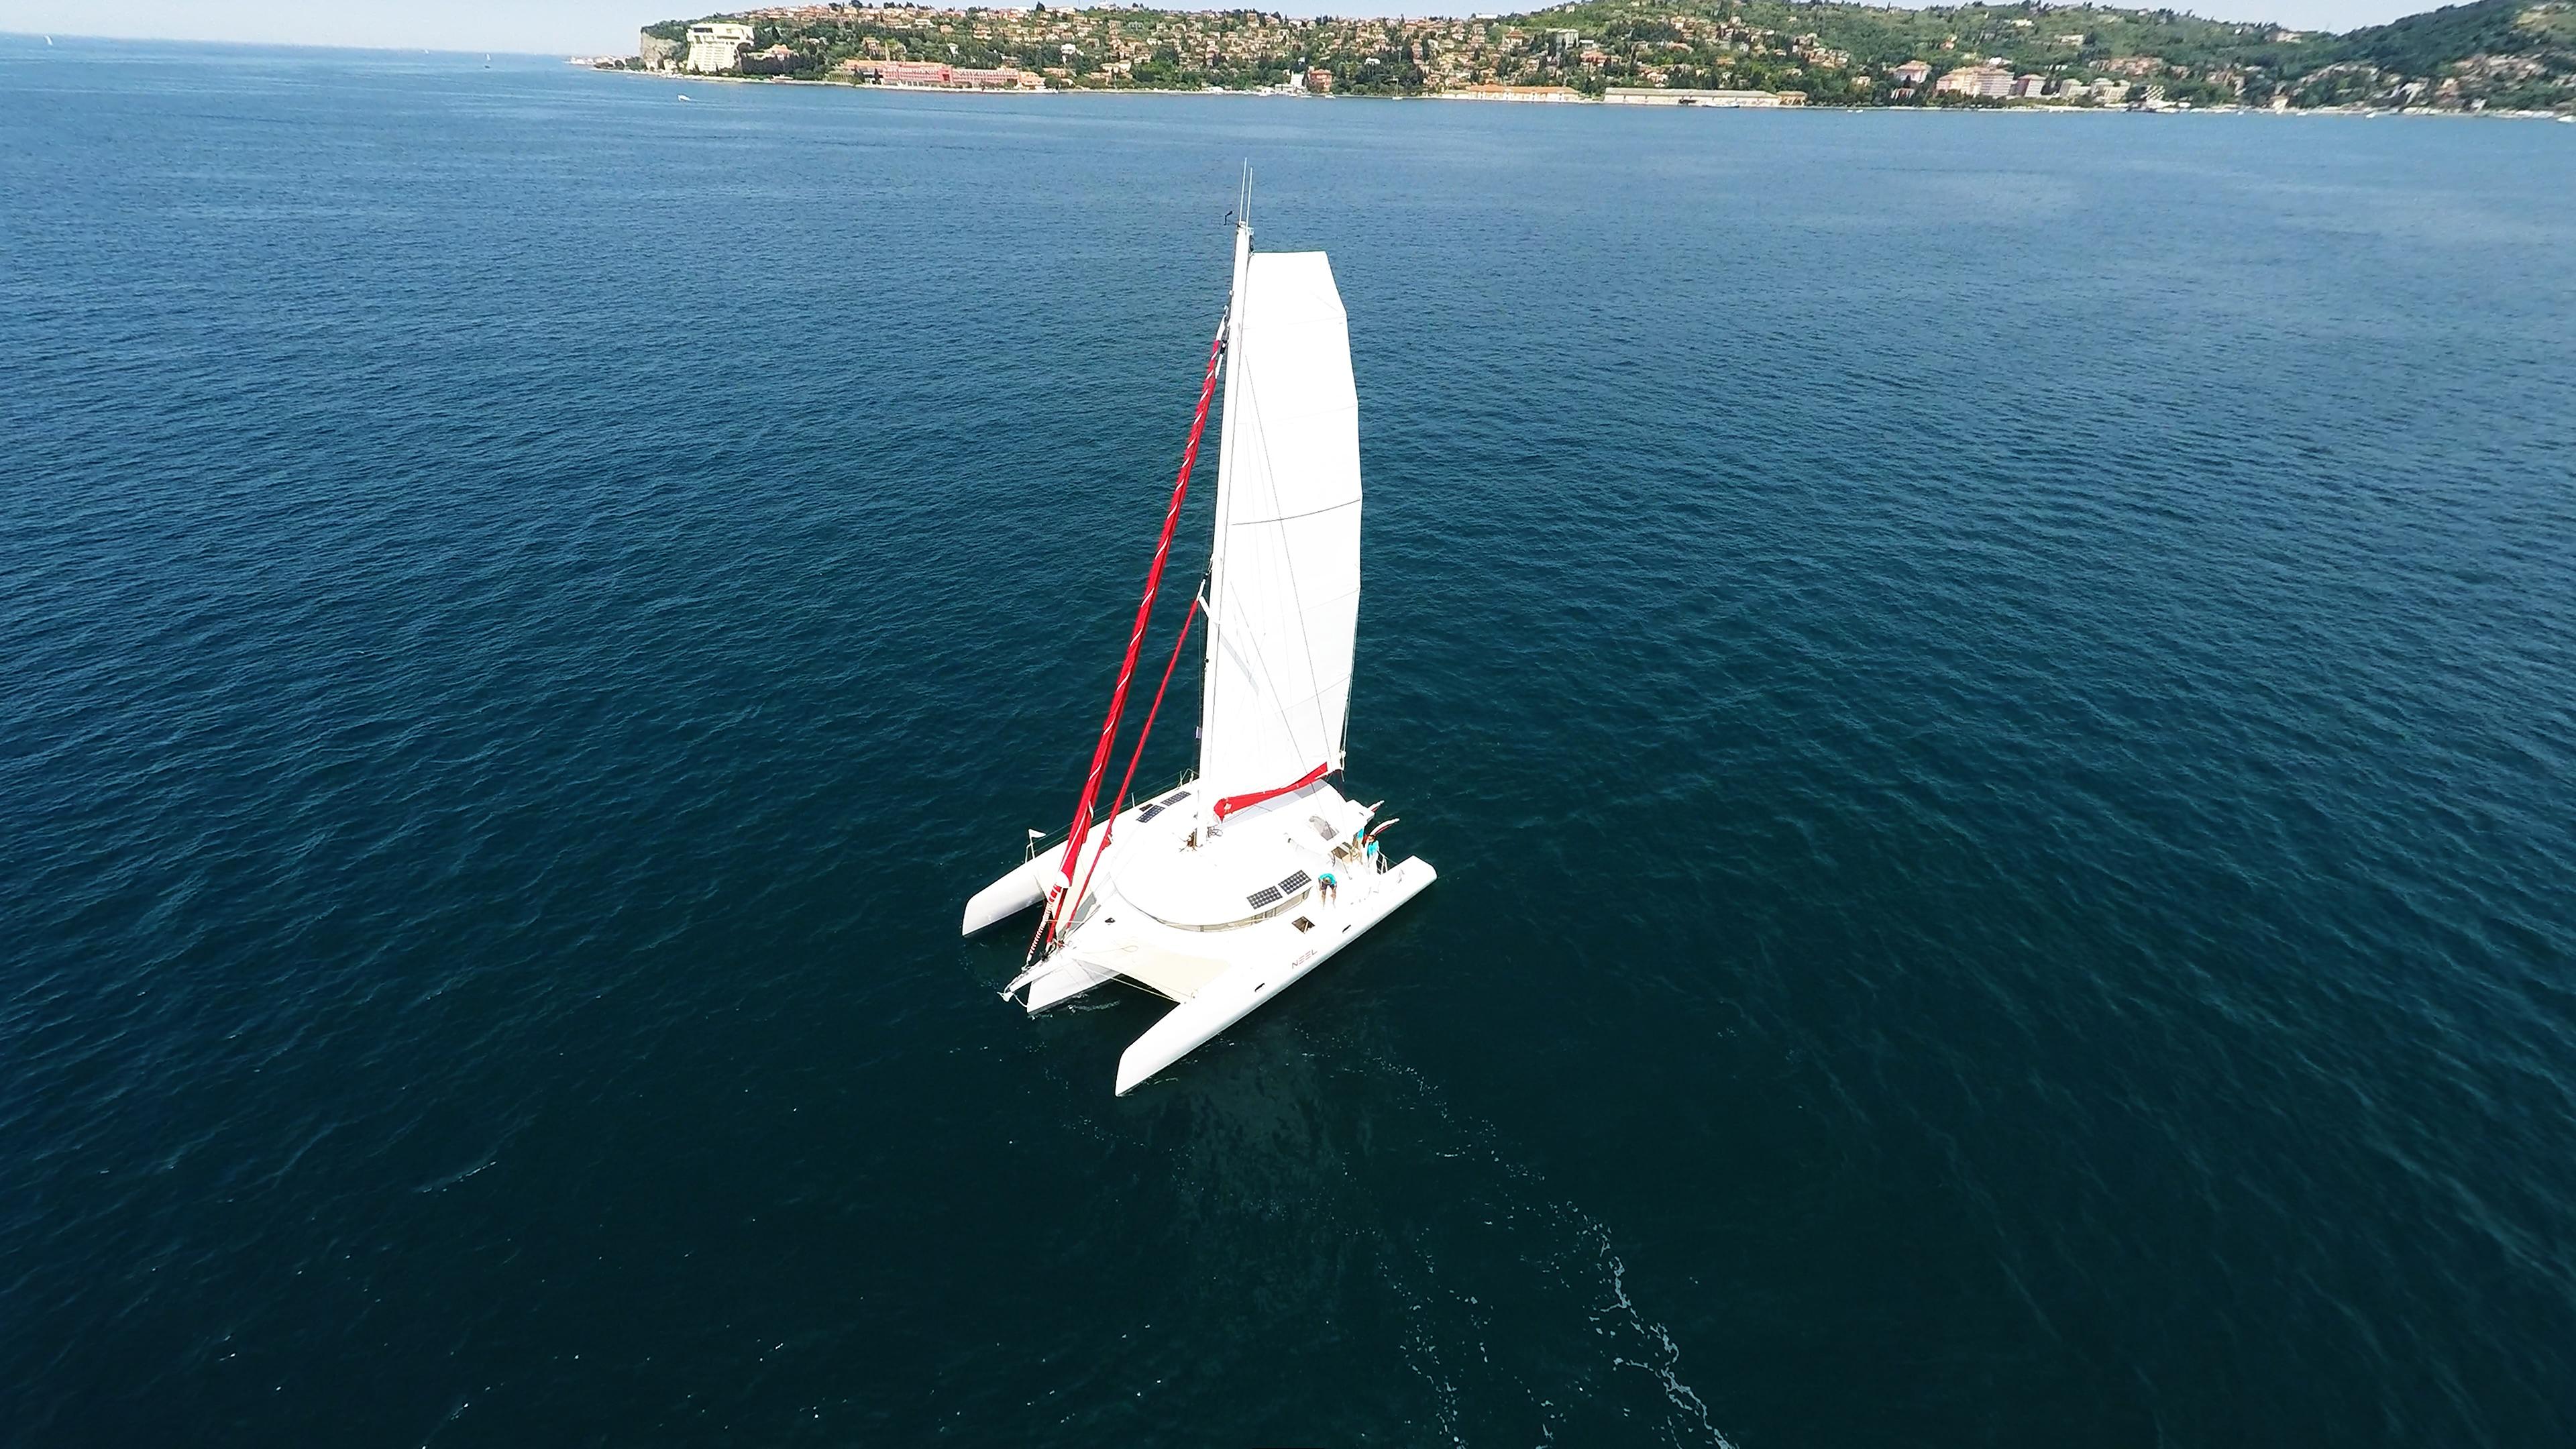 trimaran at deep blue sea sailing yacht